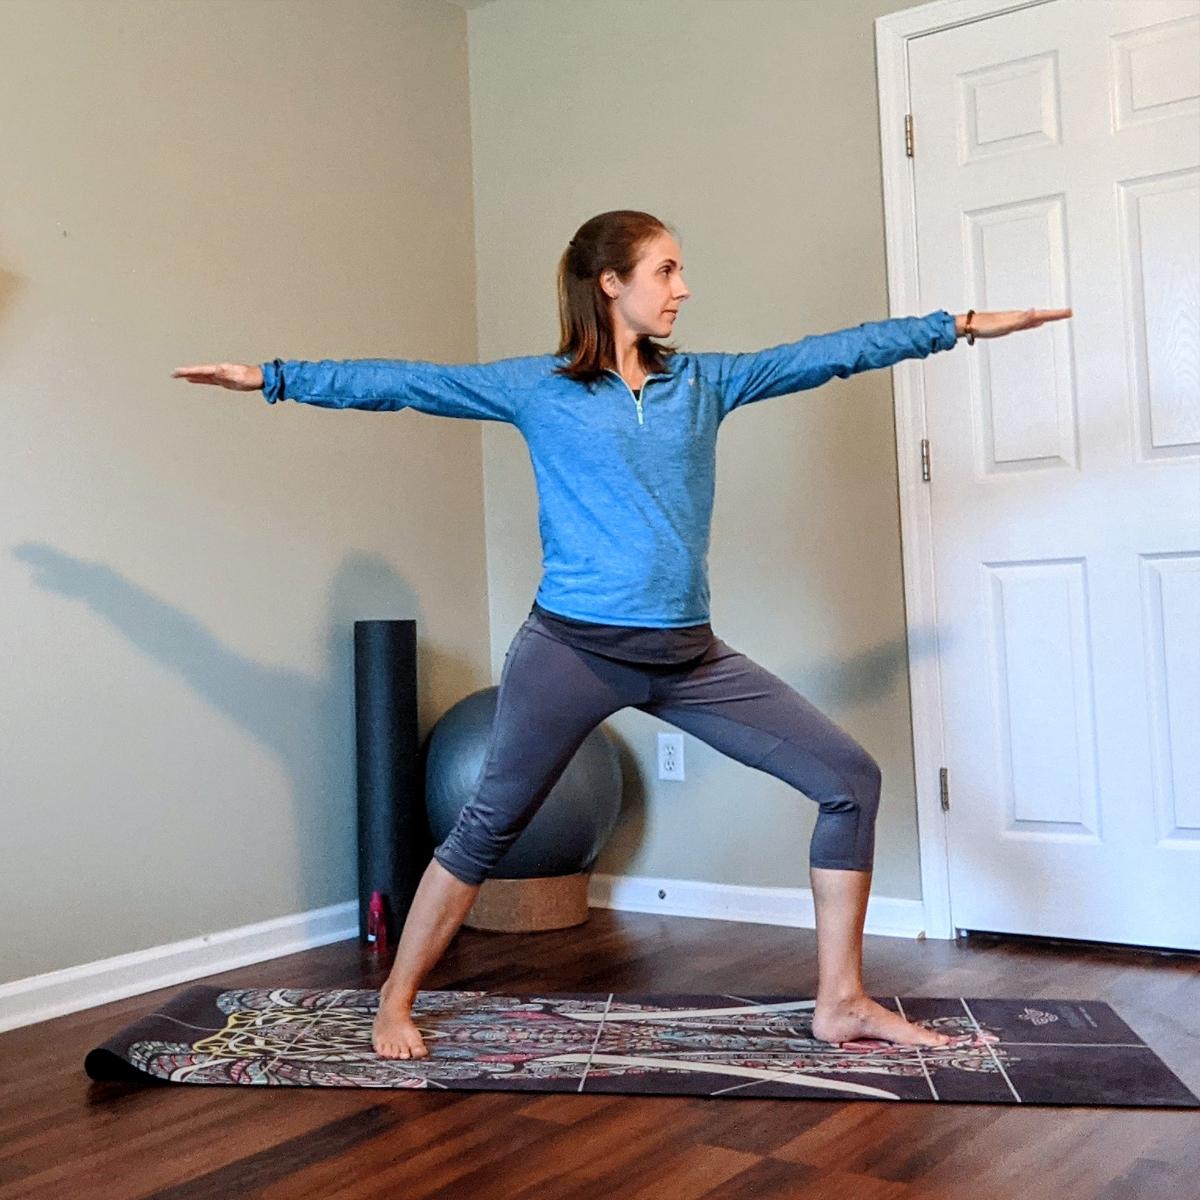 Skimble Trainer Casondra Leblanc teaching a Yoga Class in her home